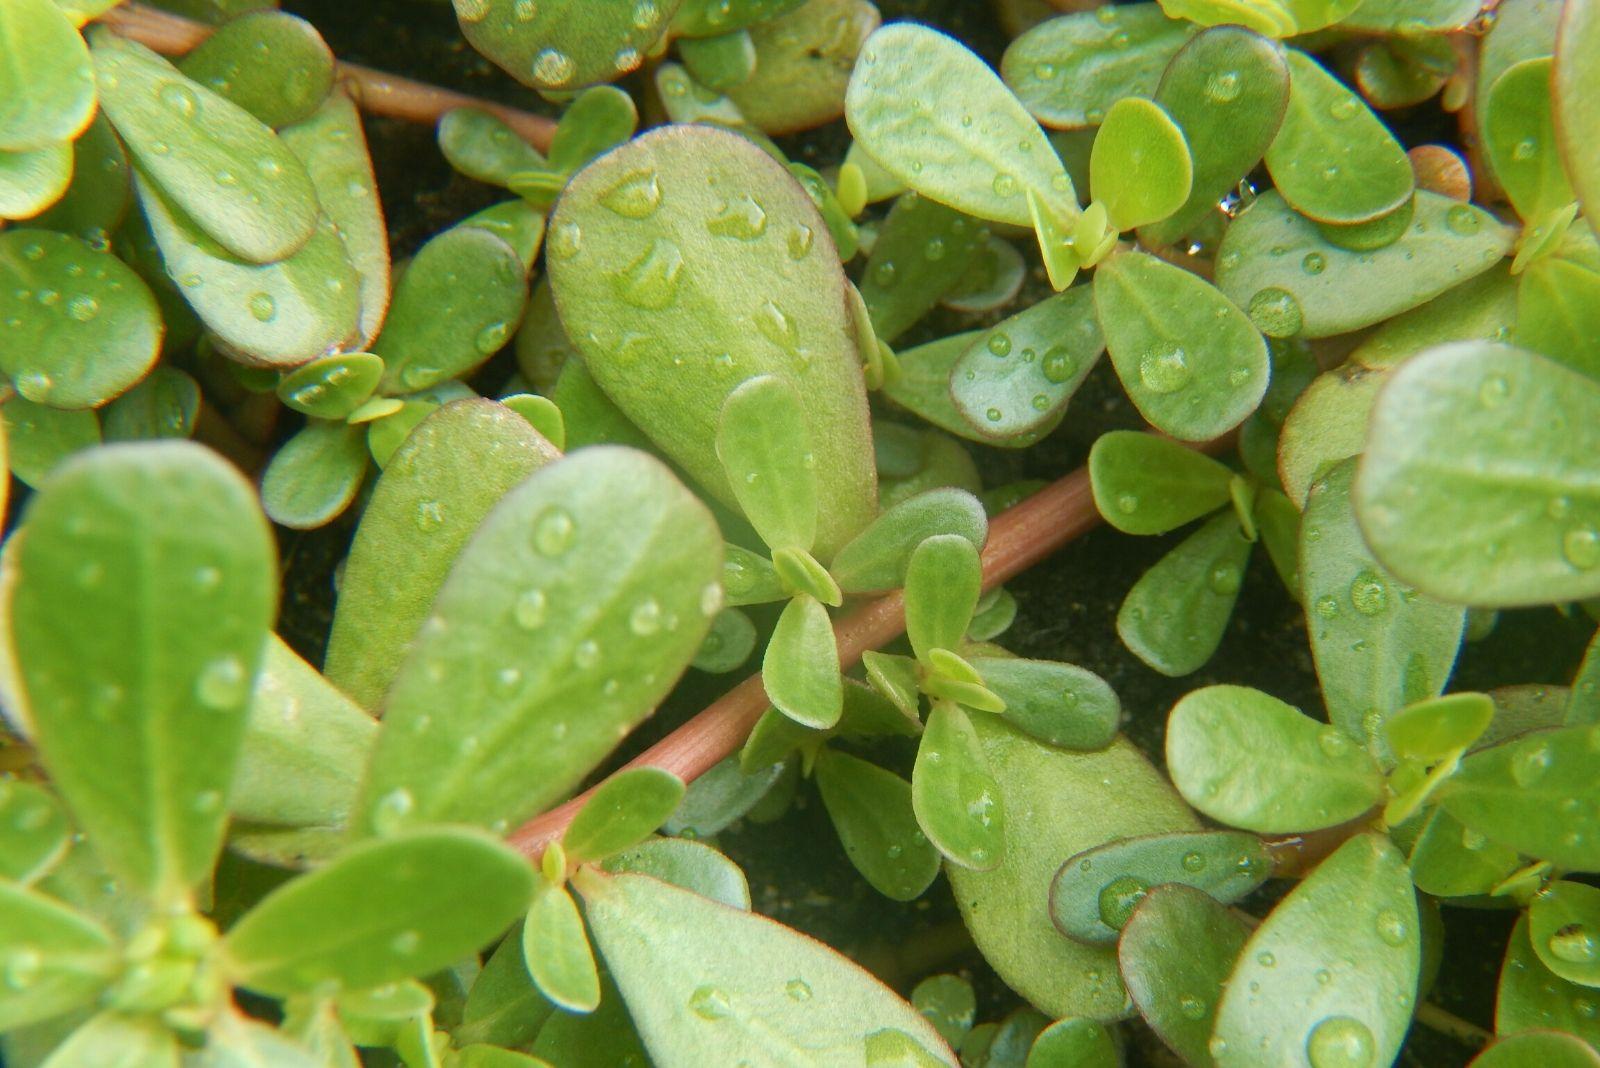 Buy Purslane Seeds 100% Organic Top Quality - Grow Food Guide